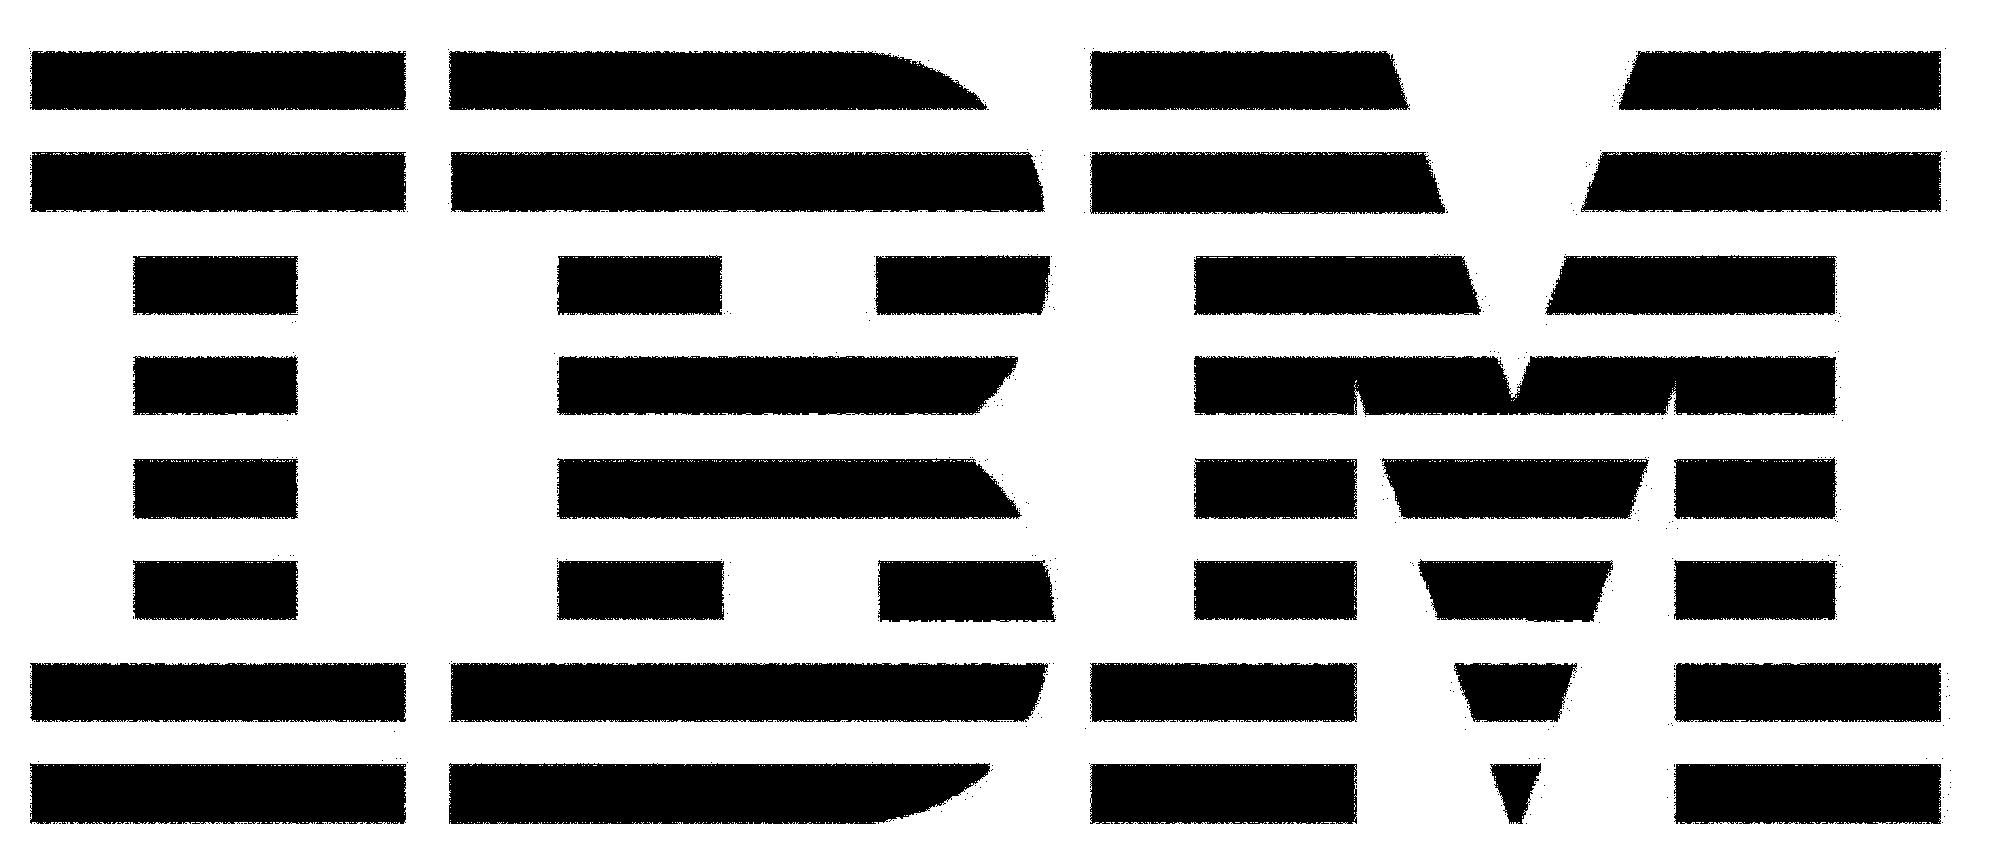 Logo Ibm PNG Transparent Logo Ibm.PNG Images..